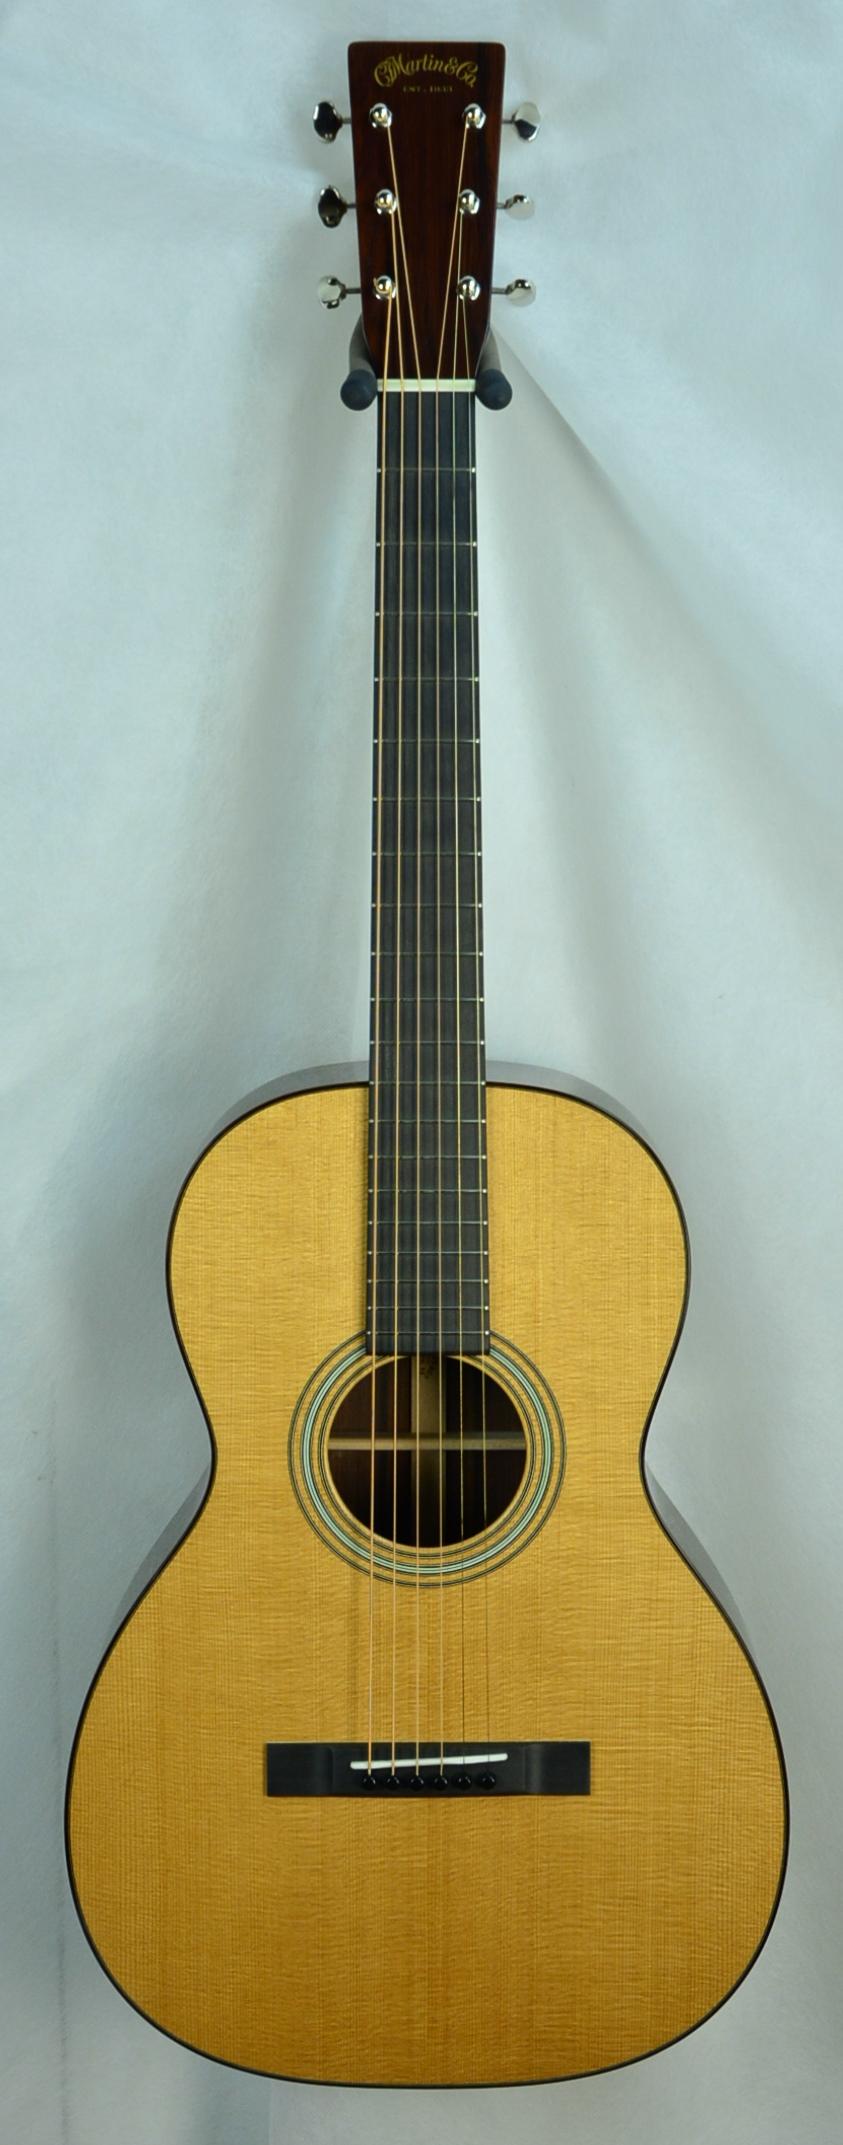 Q-2574324 S-1912492 0-12 Guatemalan Sitka M1 Satin Laq neck  (1).JPG